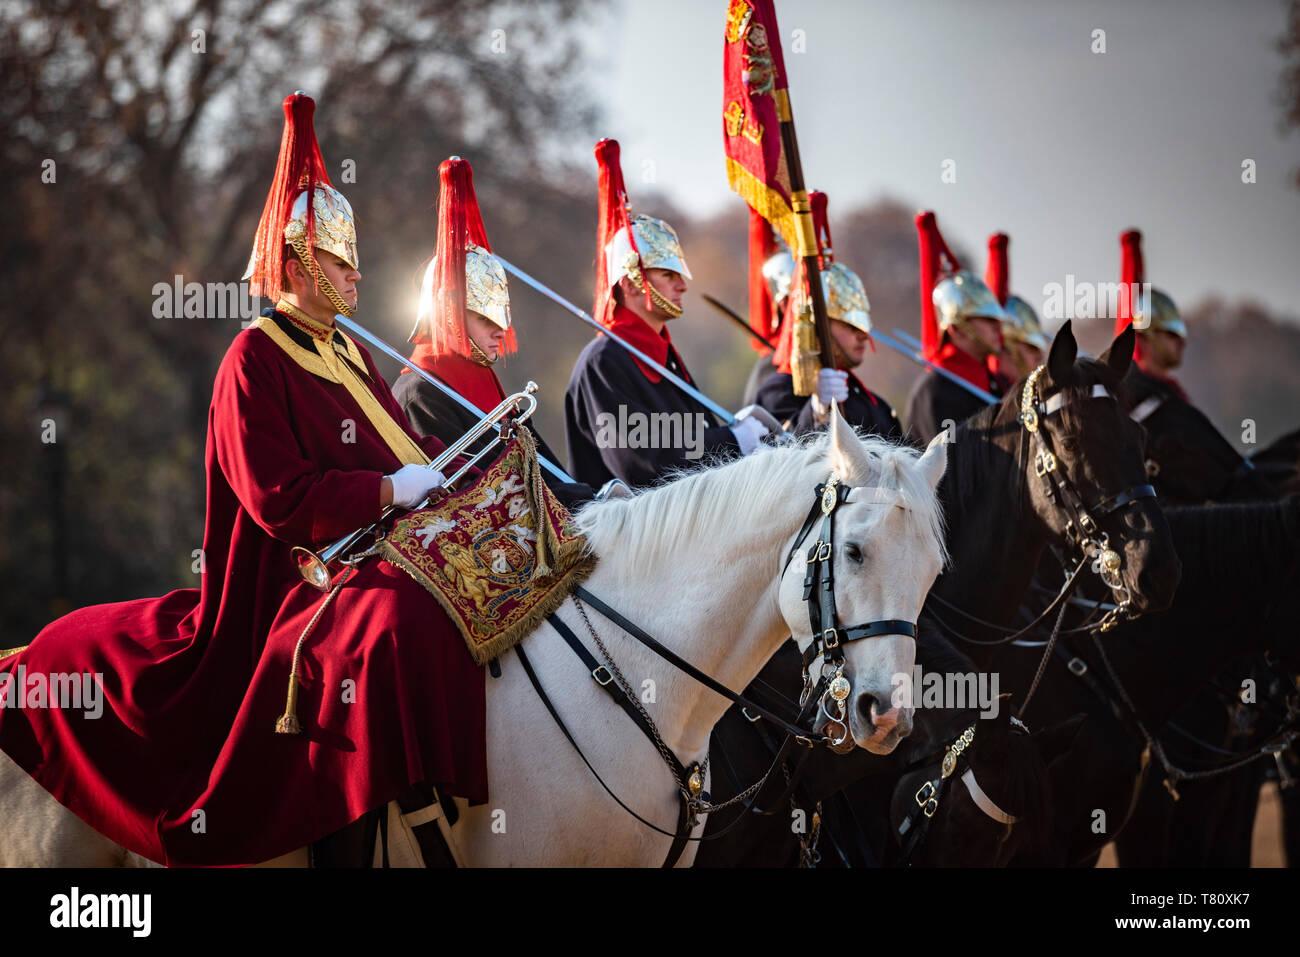 El cambio de guardia, guardias a caballo, Westminster, London, England, Reino Unido, Europa Foto de stock